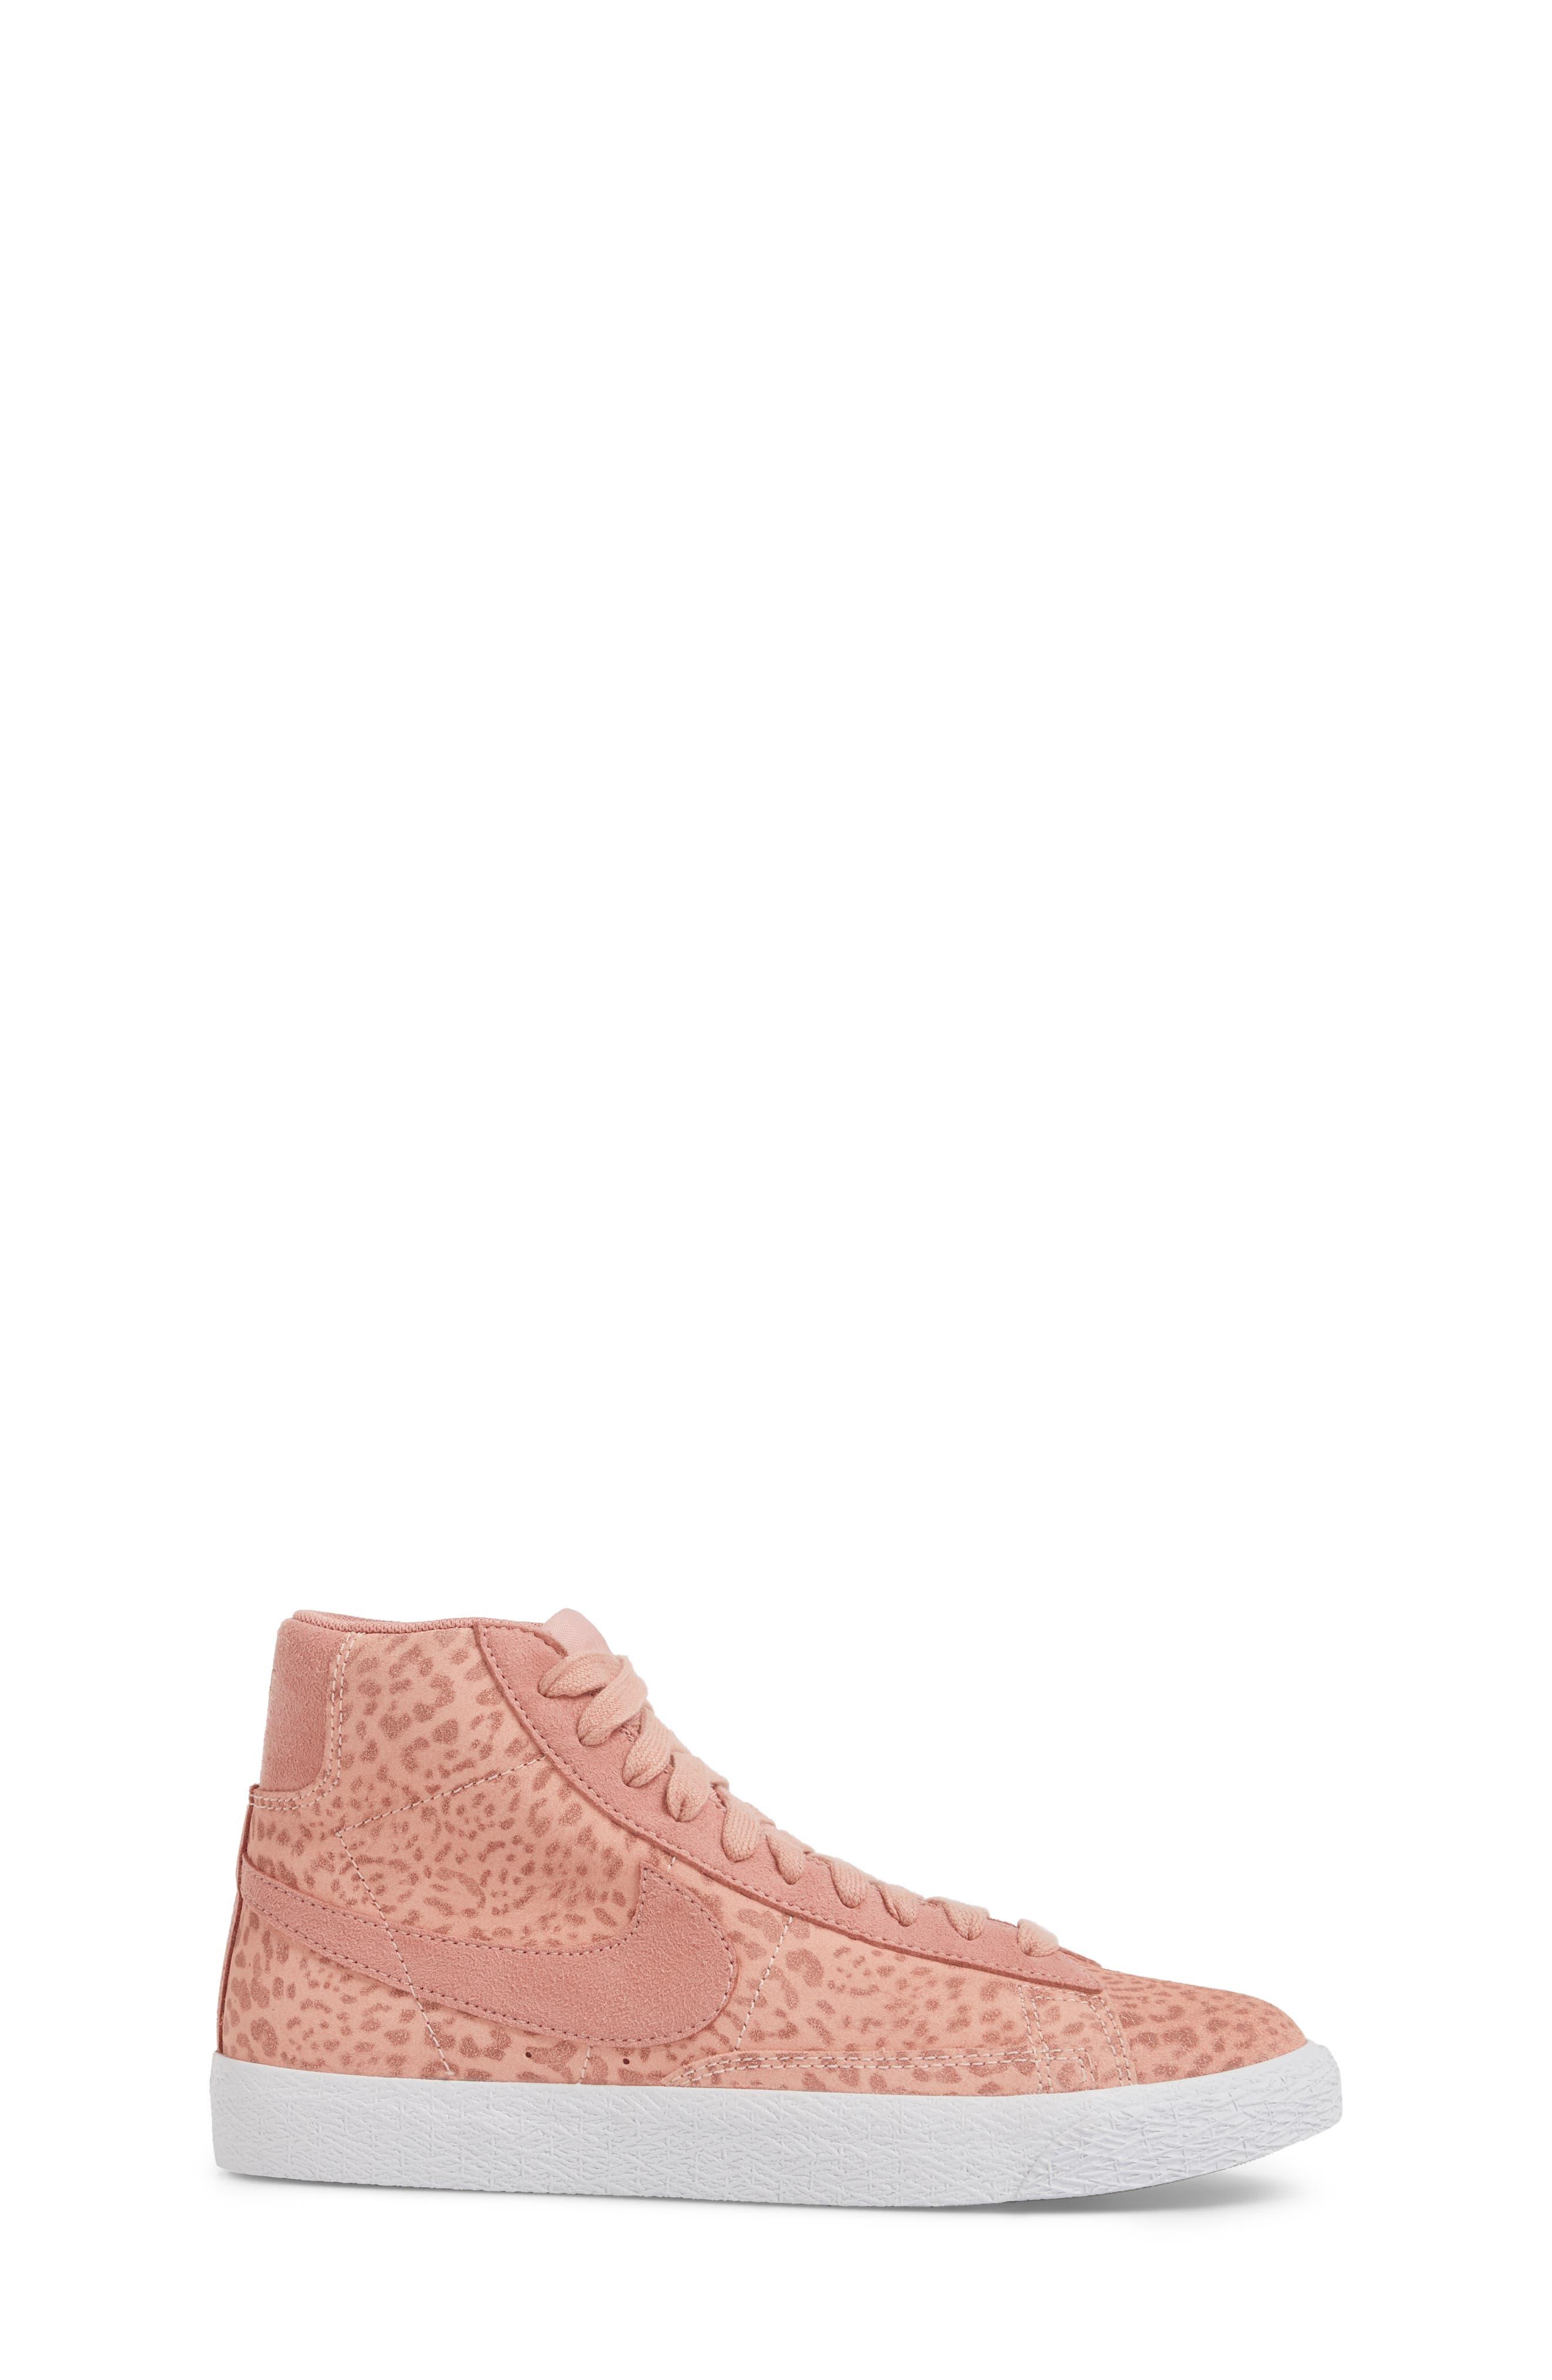 Blazer Mid SE High Top Sneaker,                             Alternate thumbnail 8, color,